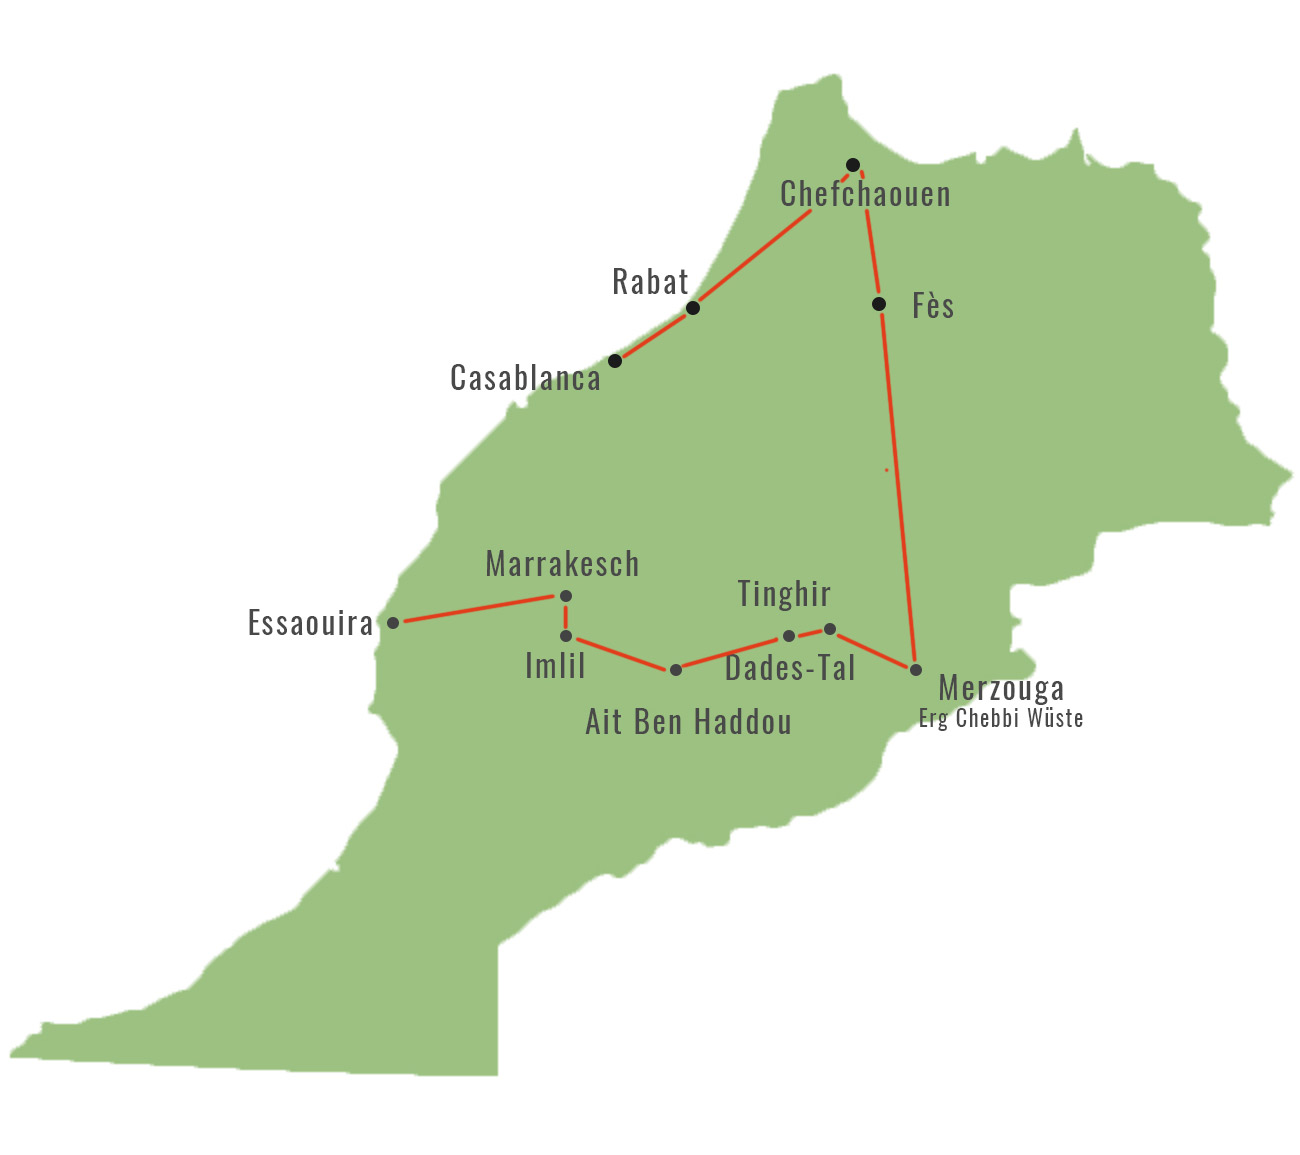 Marokko individuelle Route Roadtrip Map Karte